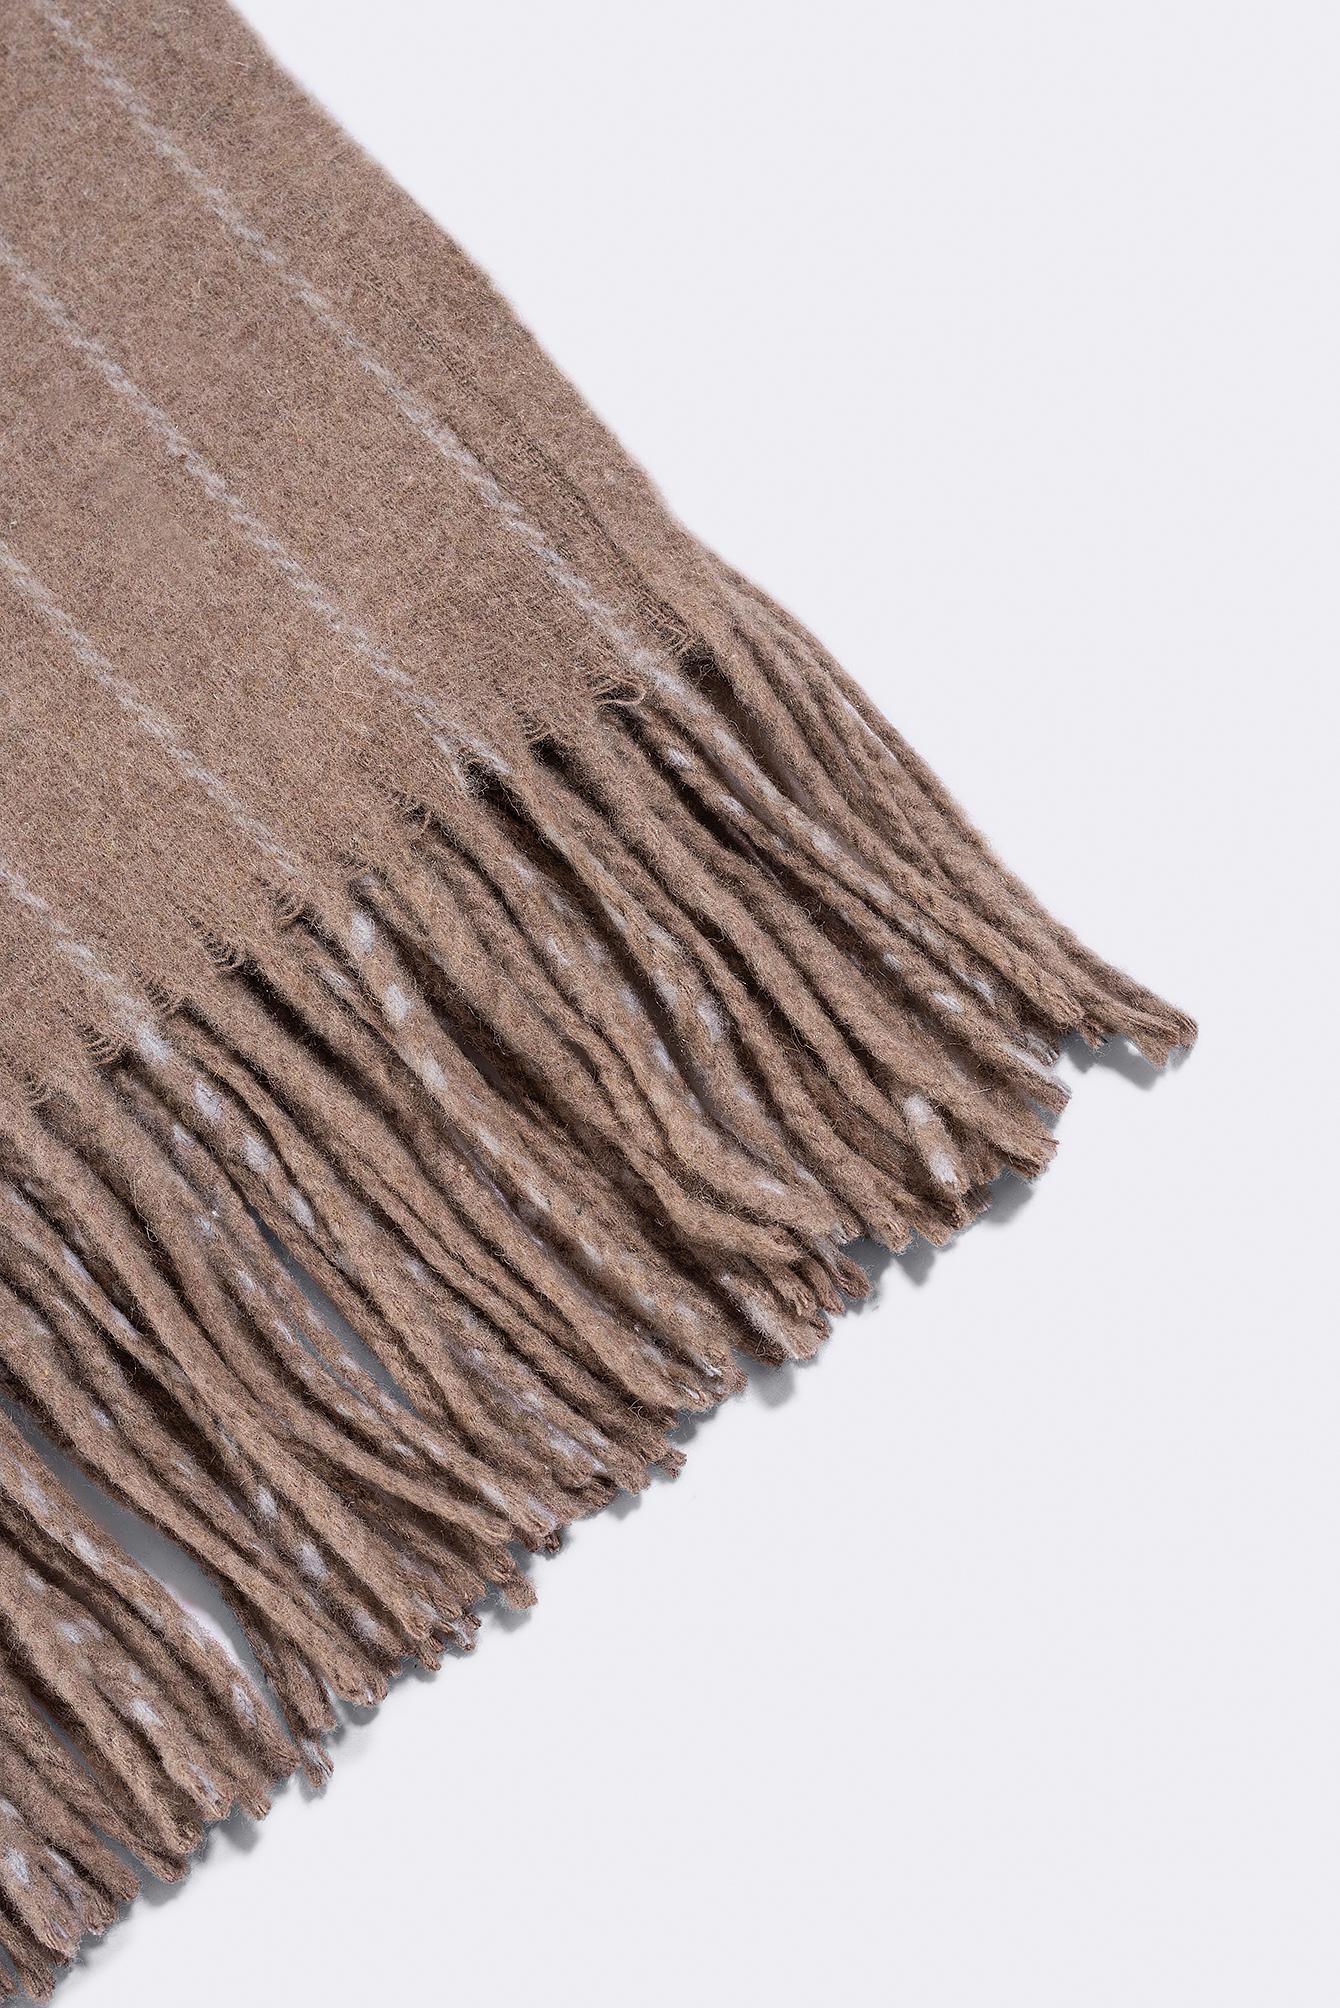 Woven Pinstripe Scarf NA-KD.COM